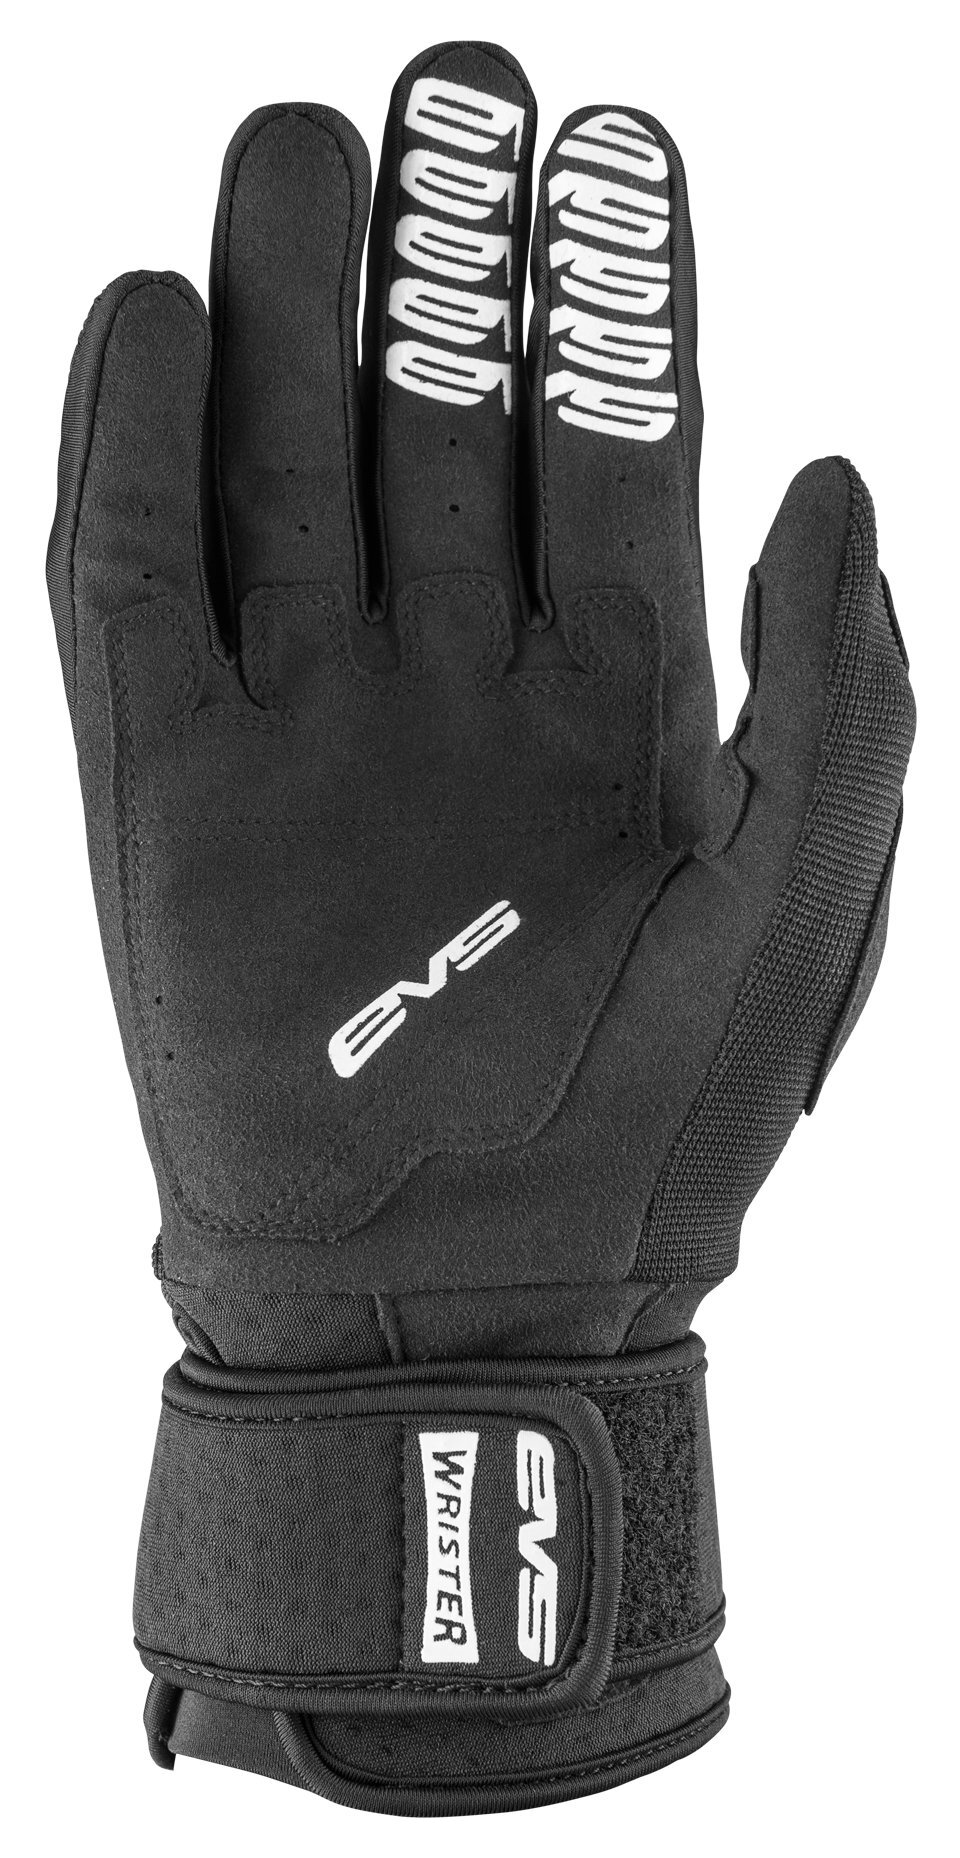 EVS Wrister Gloves